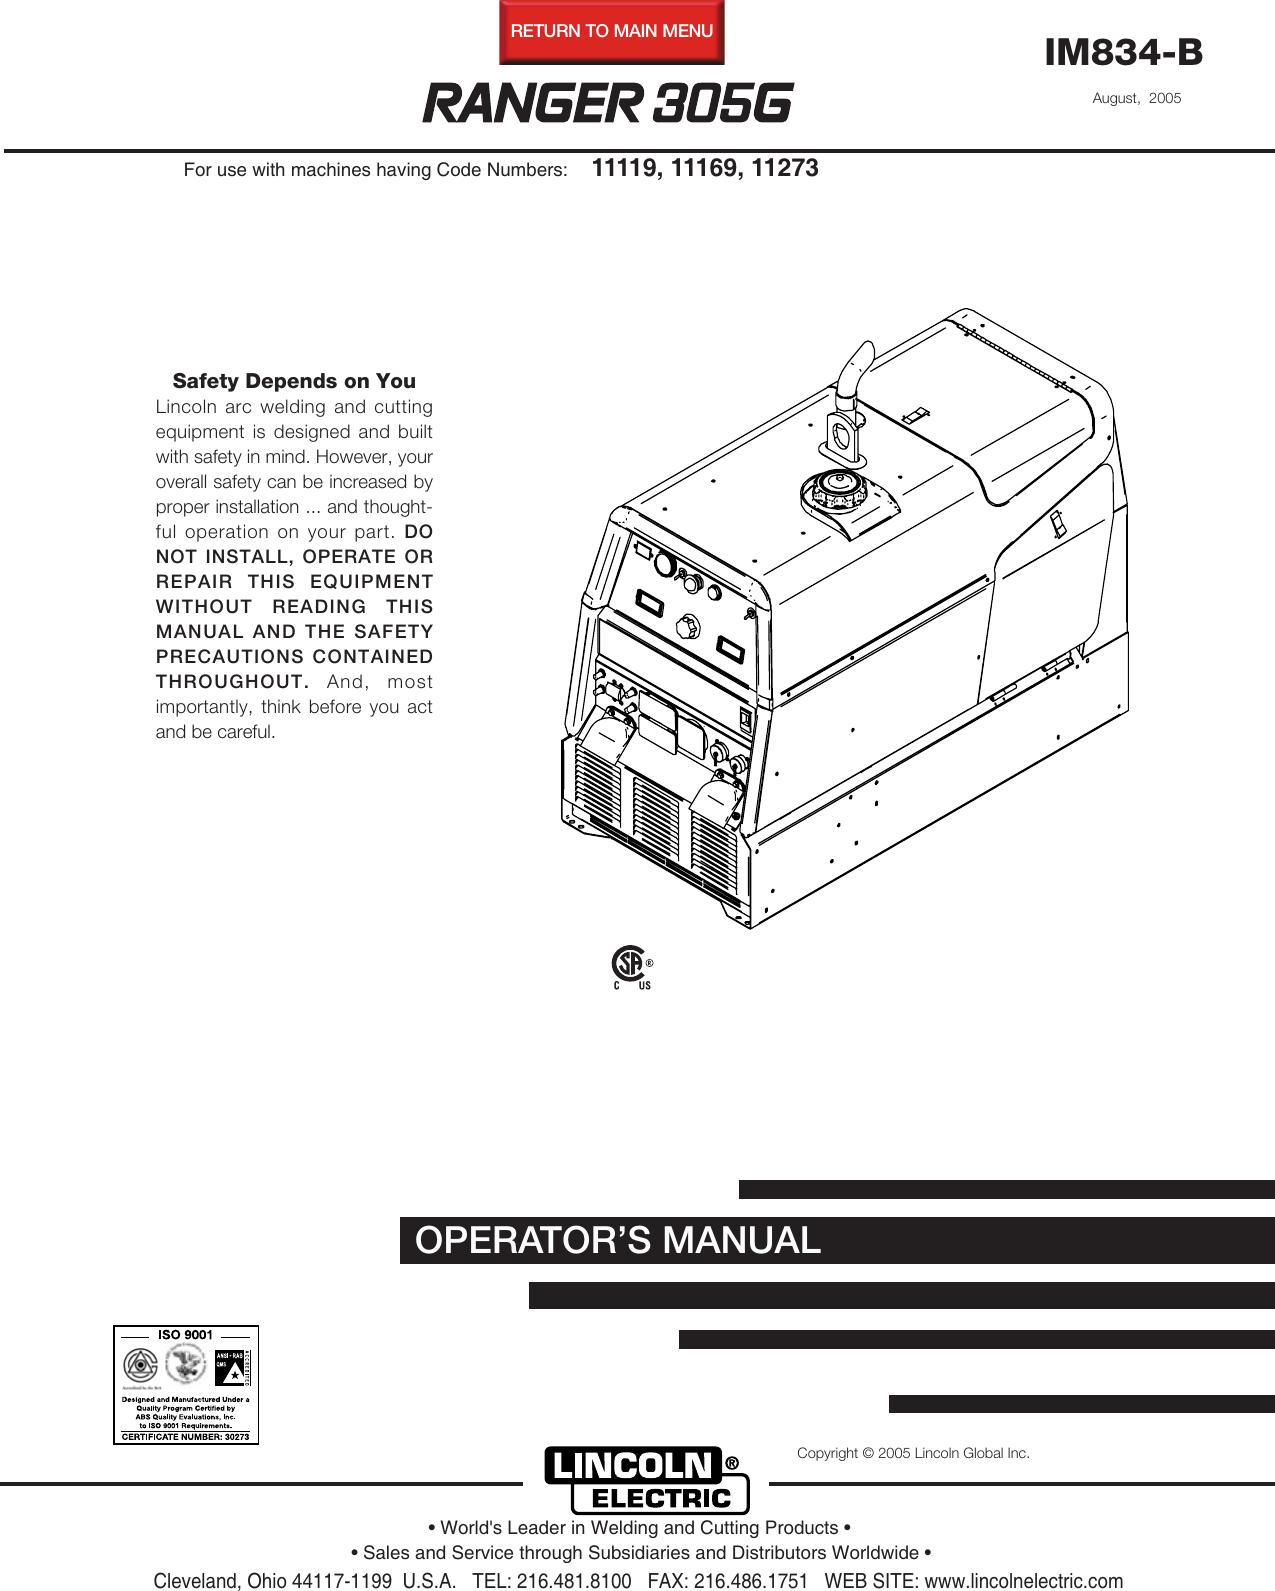 Lincoln Electric Ranger Im834 B Users Manual Image 50 Amp Welder Plug Wiring Download